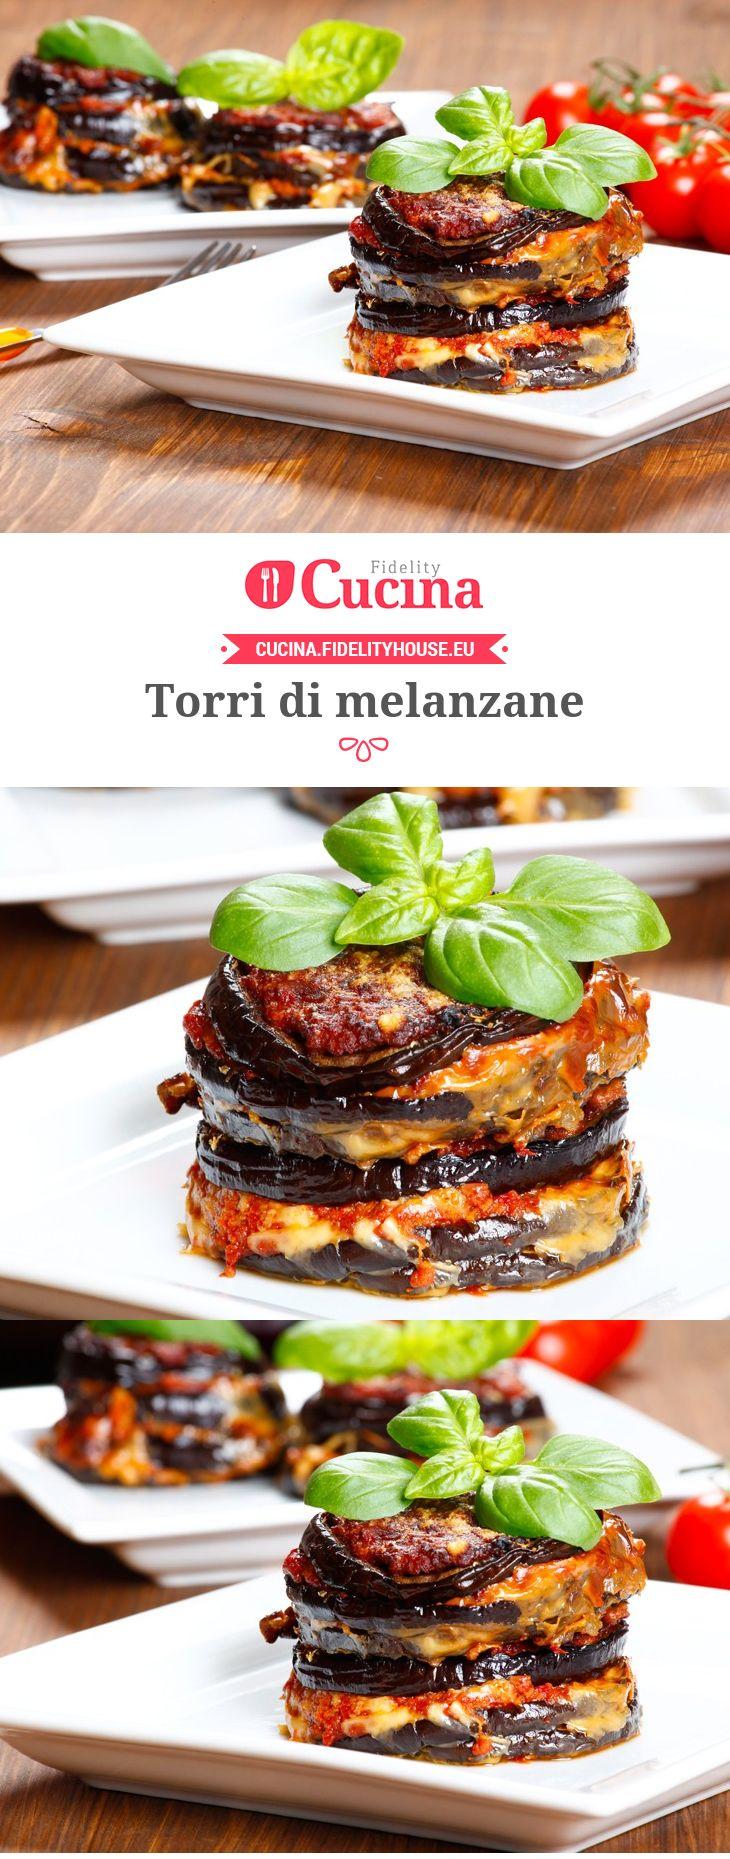 Torta melanzane Eggplant Aubergine